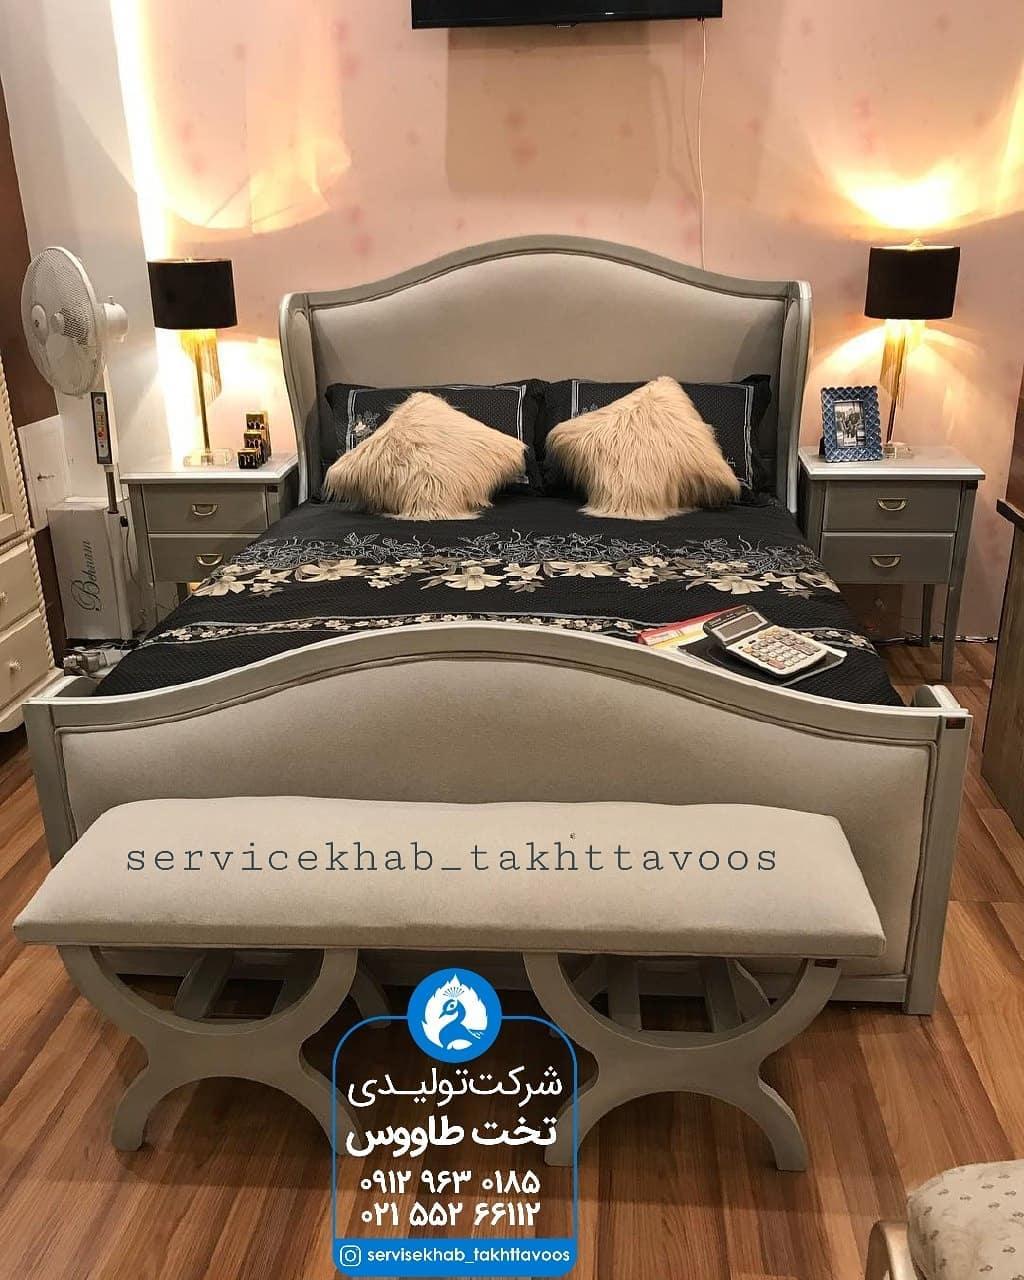 servicekhab_takhttavoos-20210911-0014